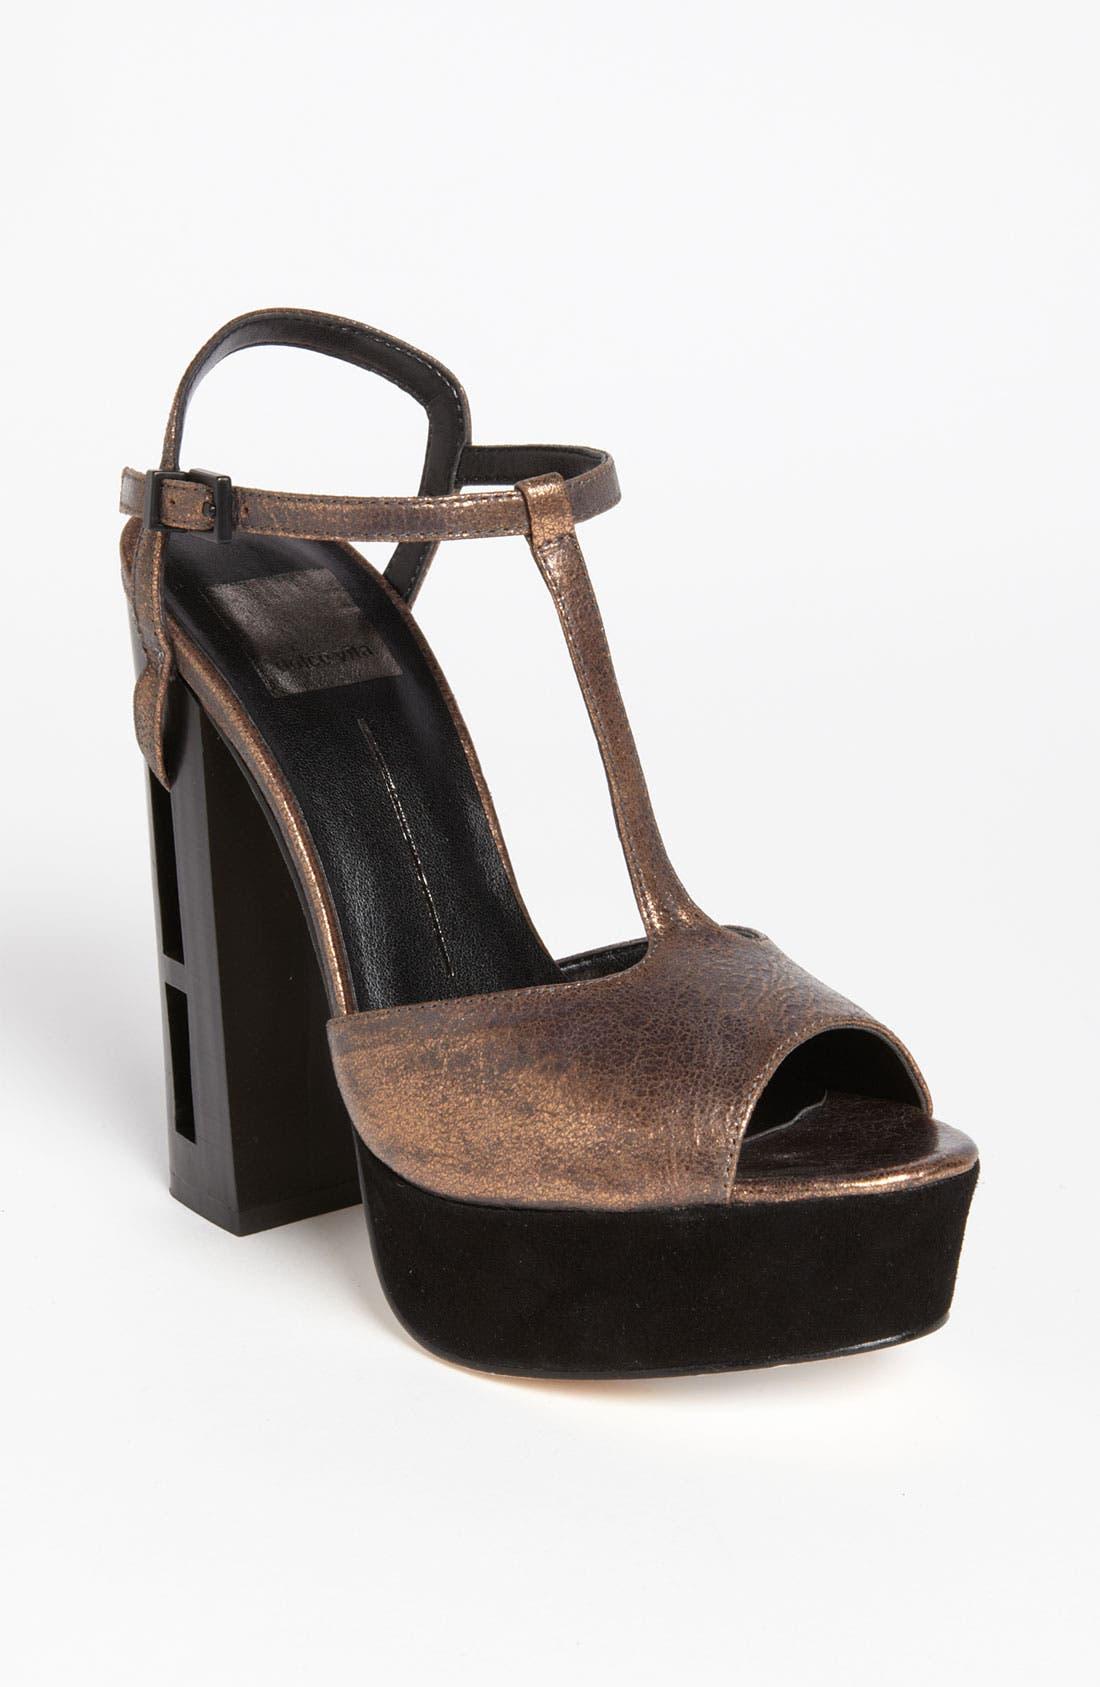 Alternate Image 1 Selected - Dolce Vita 'Jenna' Platform Sandal